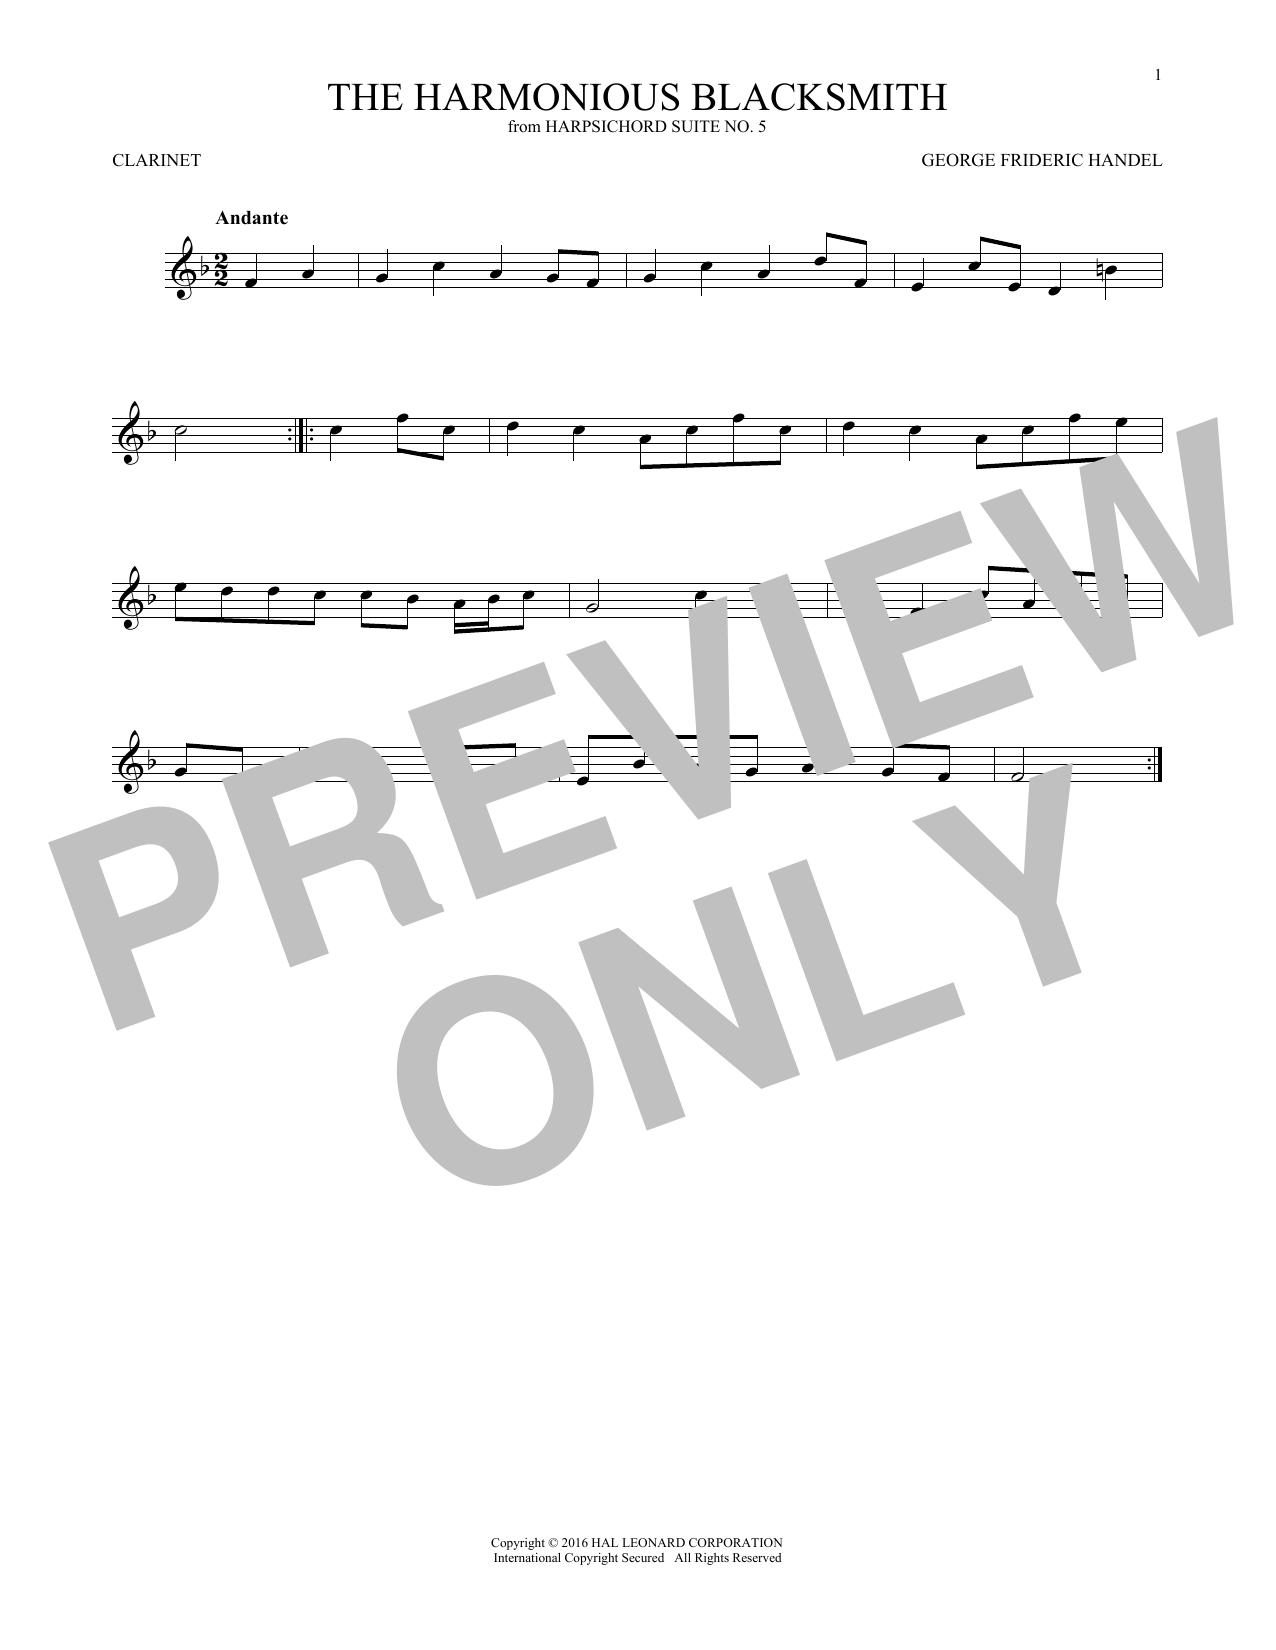 Harmonious Blacksmith (Clarinet Solo)